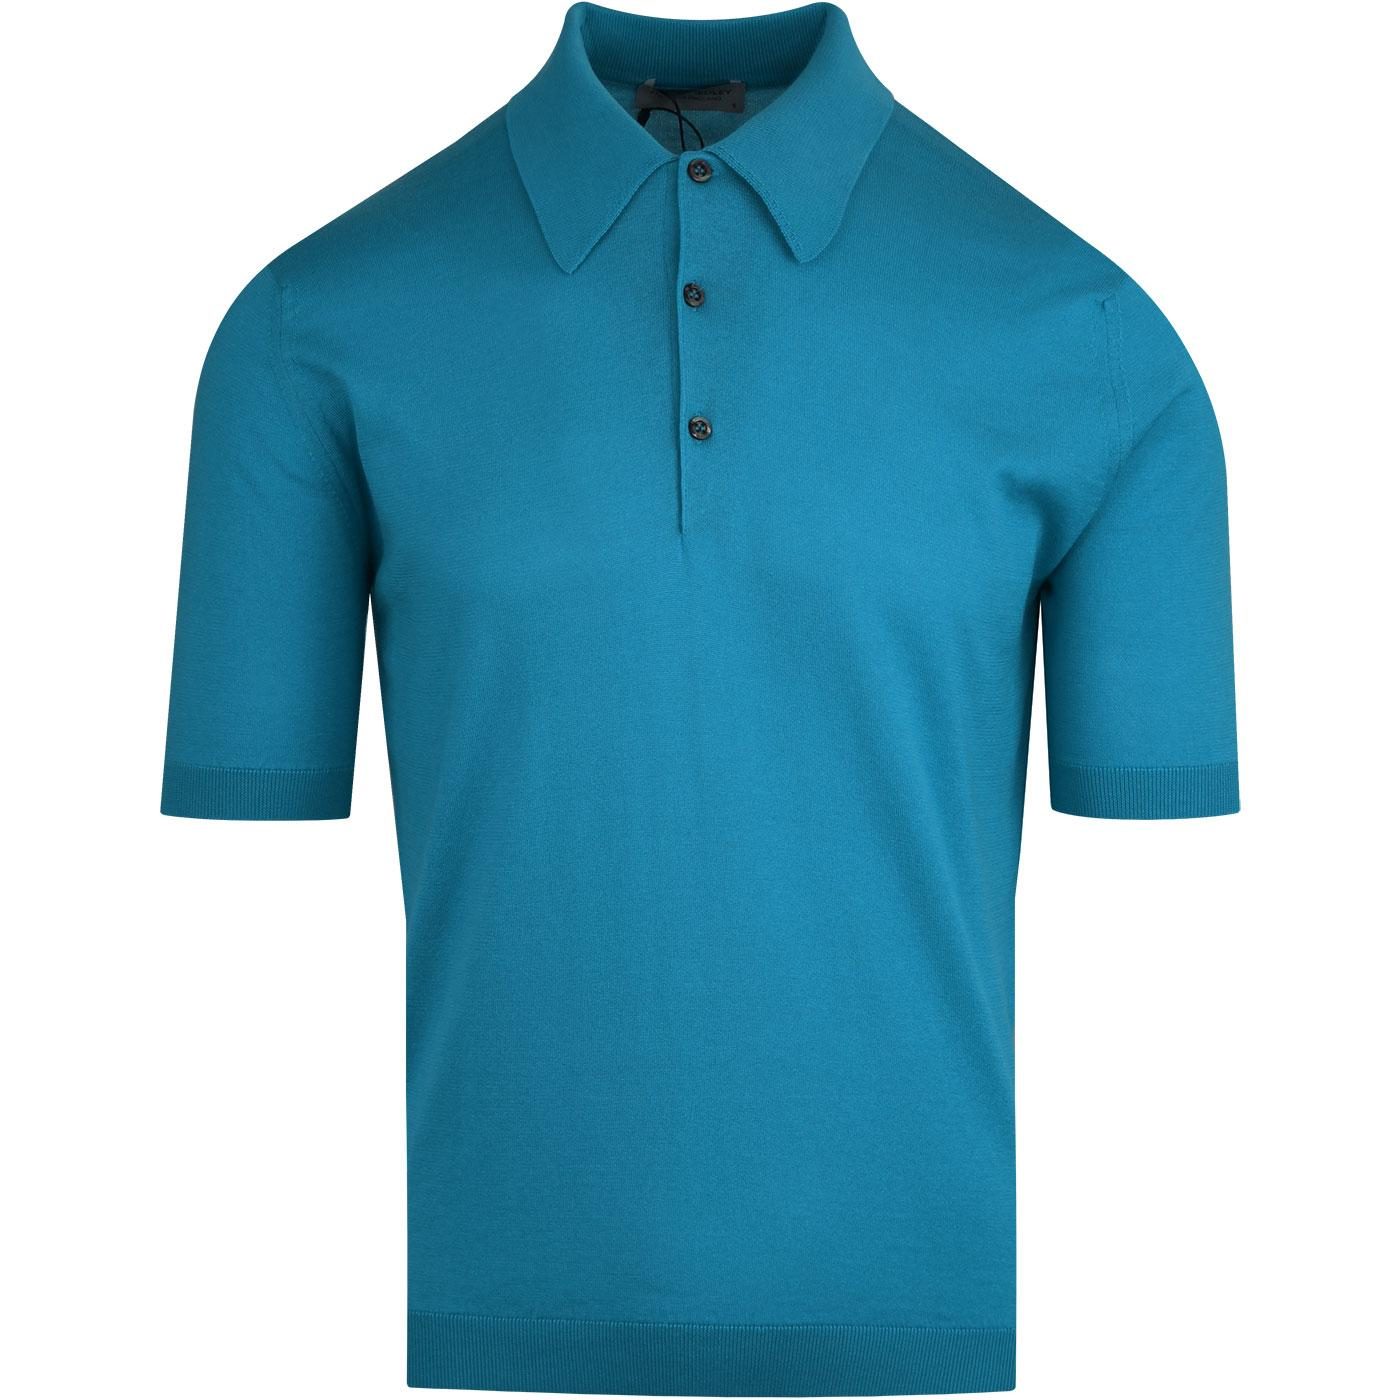 Isis JOHN SMEDLEY Easy Fit Mod Knit Polo Shirt IB